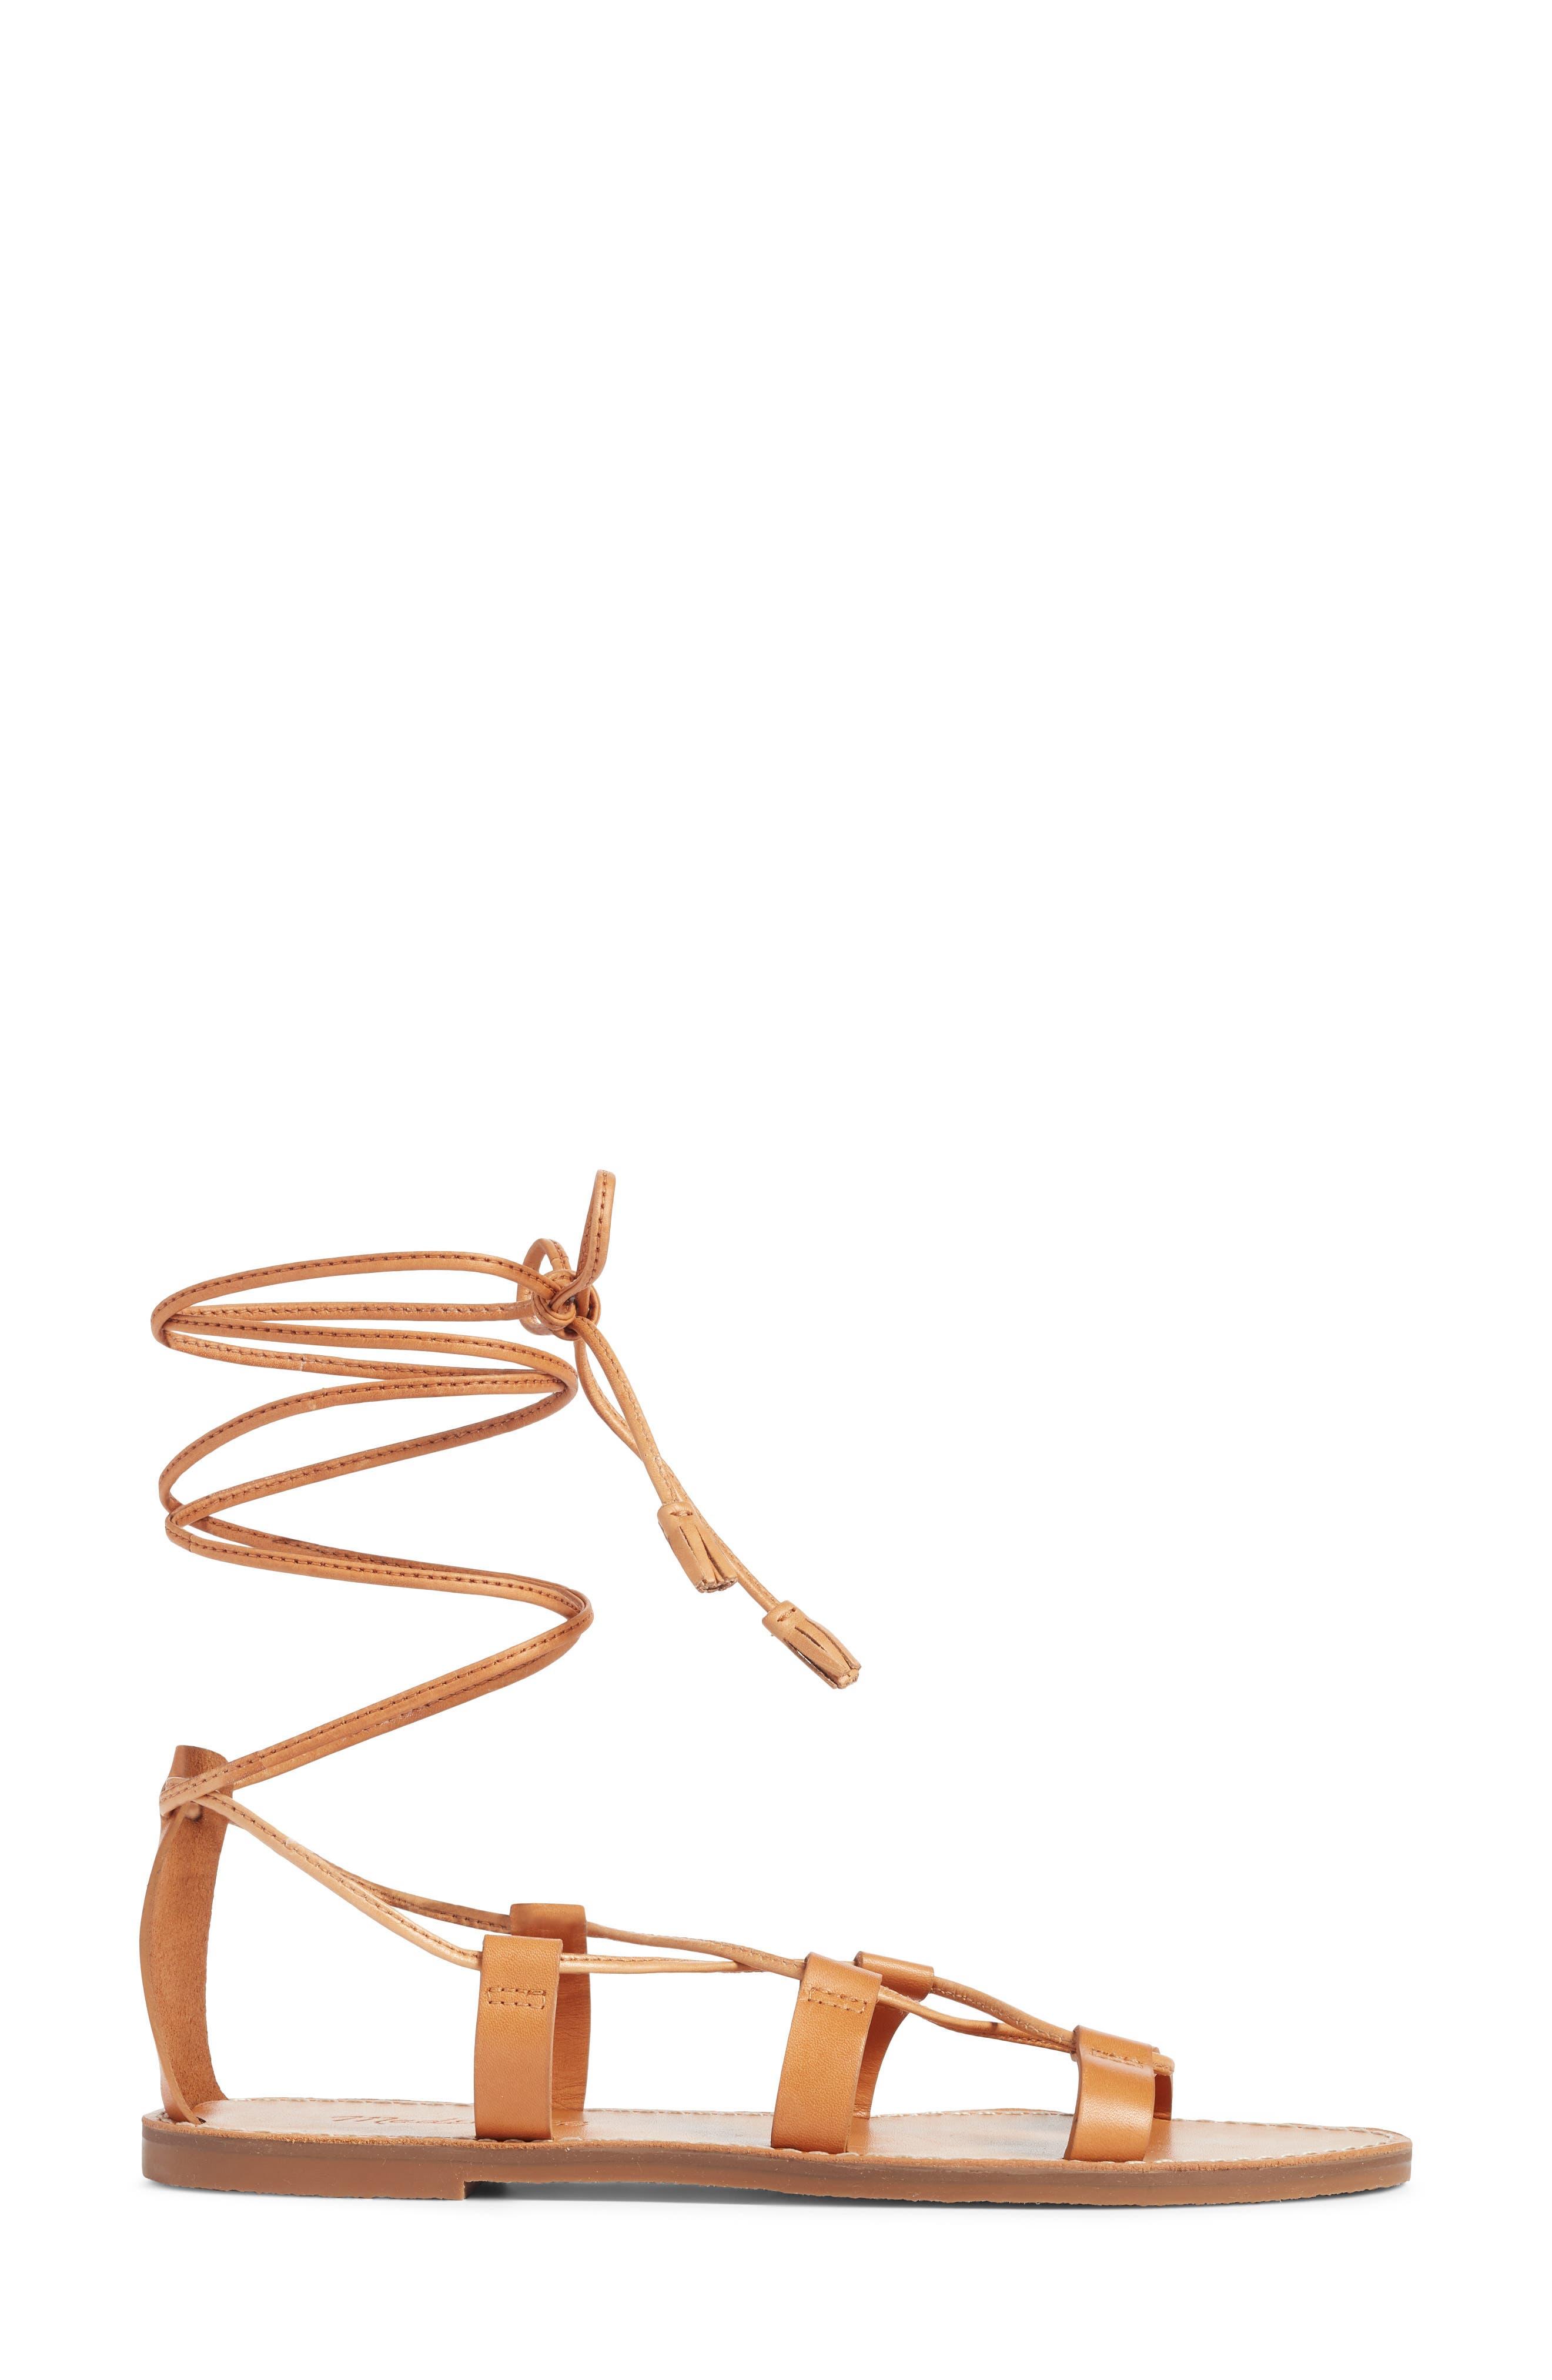 The Boardwalk Lace-Up Sandal,                             Alternate thumbnail 3, color,                             DESERT CAMEL LEATHER